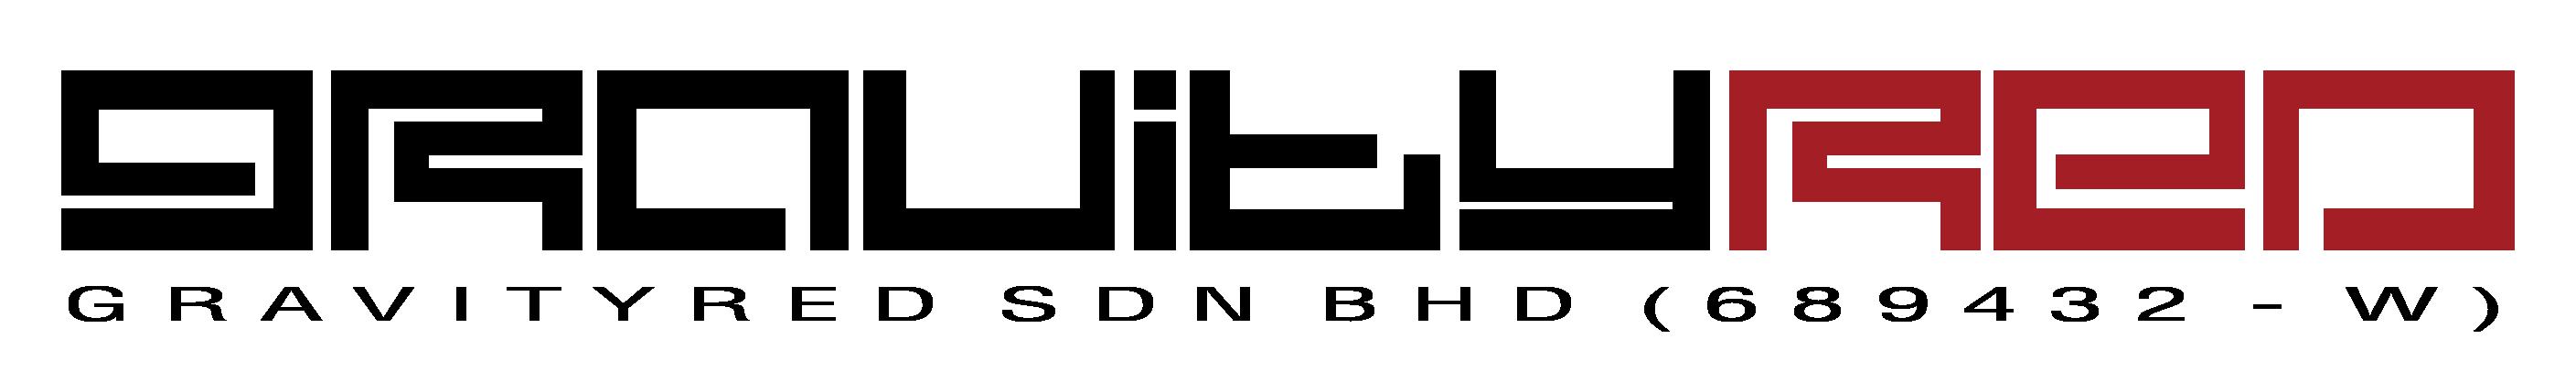 Gravityred Logo